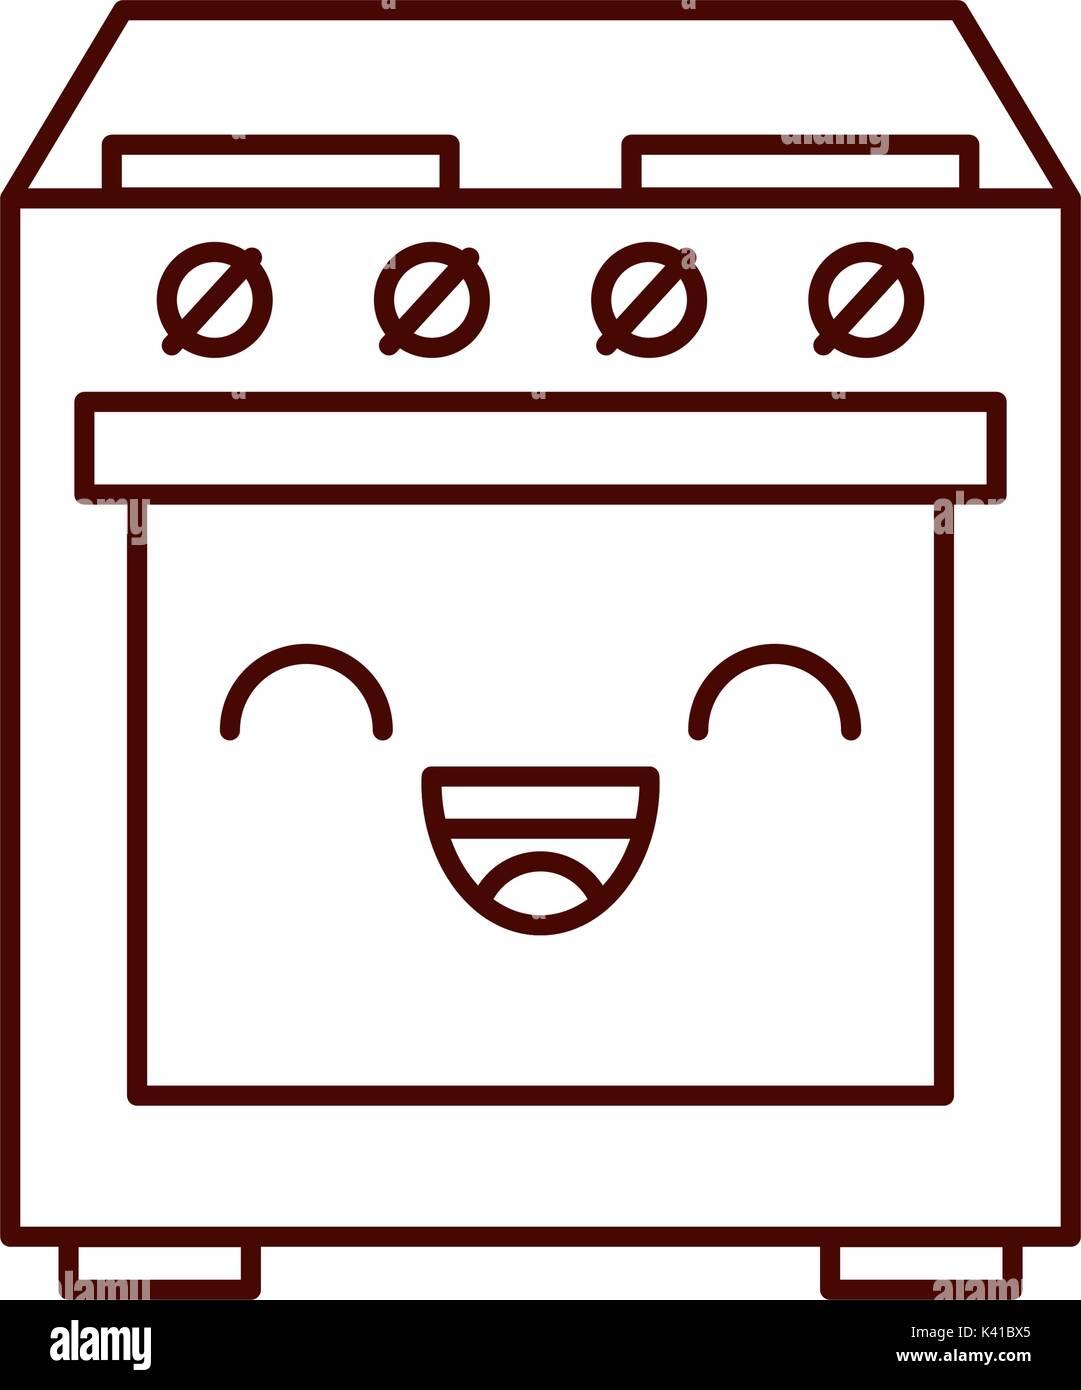 cartoon traditional oven stock photos cartoon traditional oven